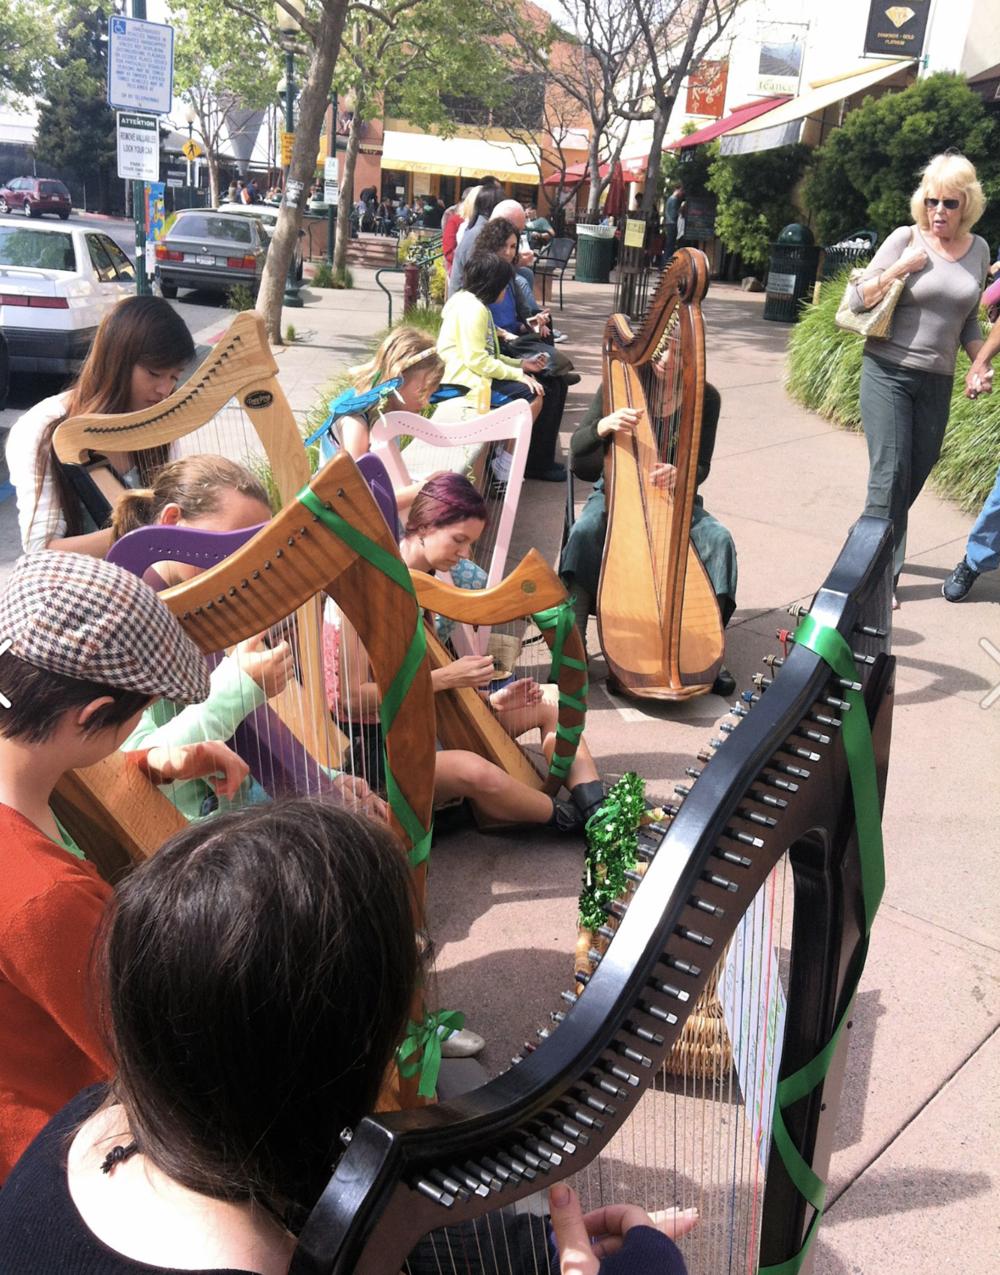 St. Patrick's Day performance // 4th St. Shops, Berkeley